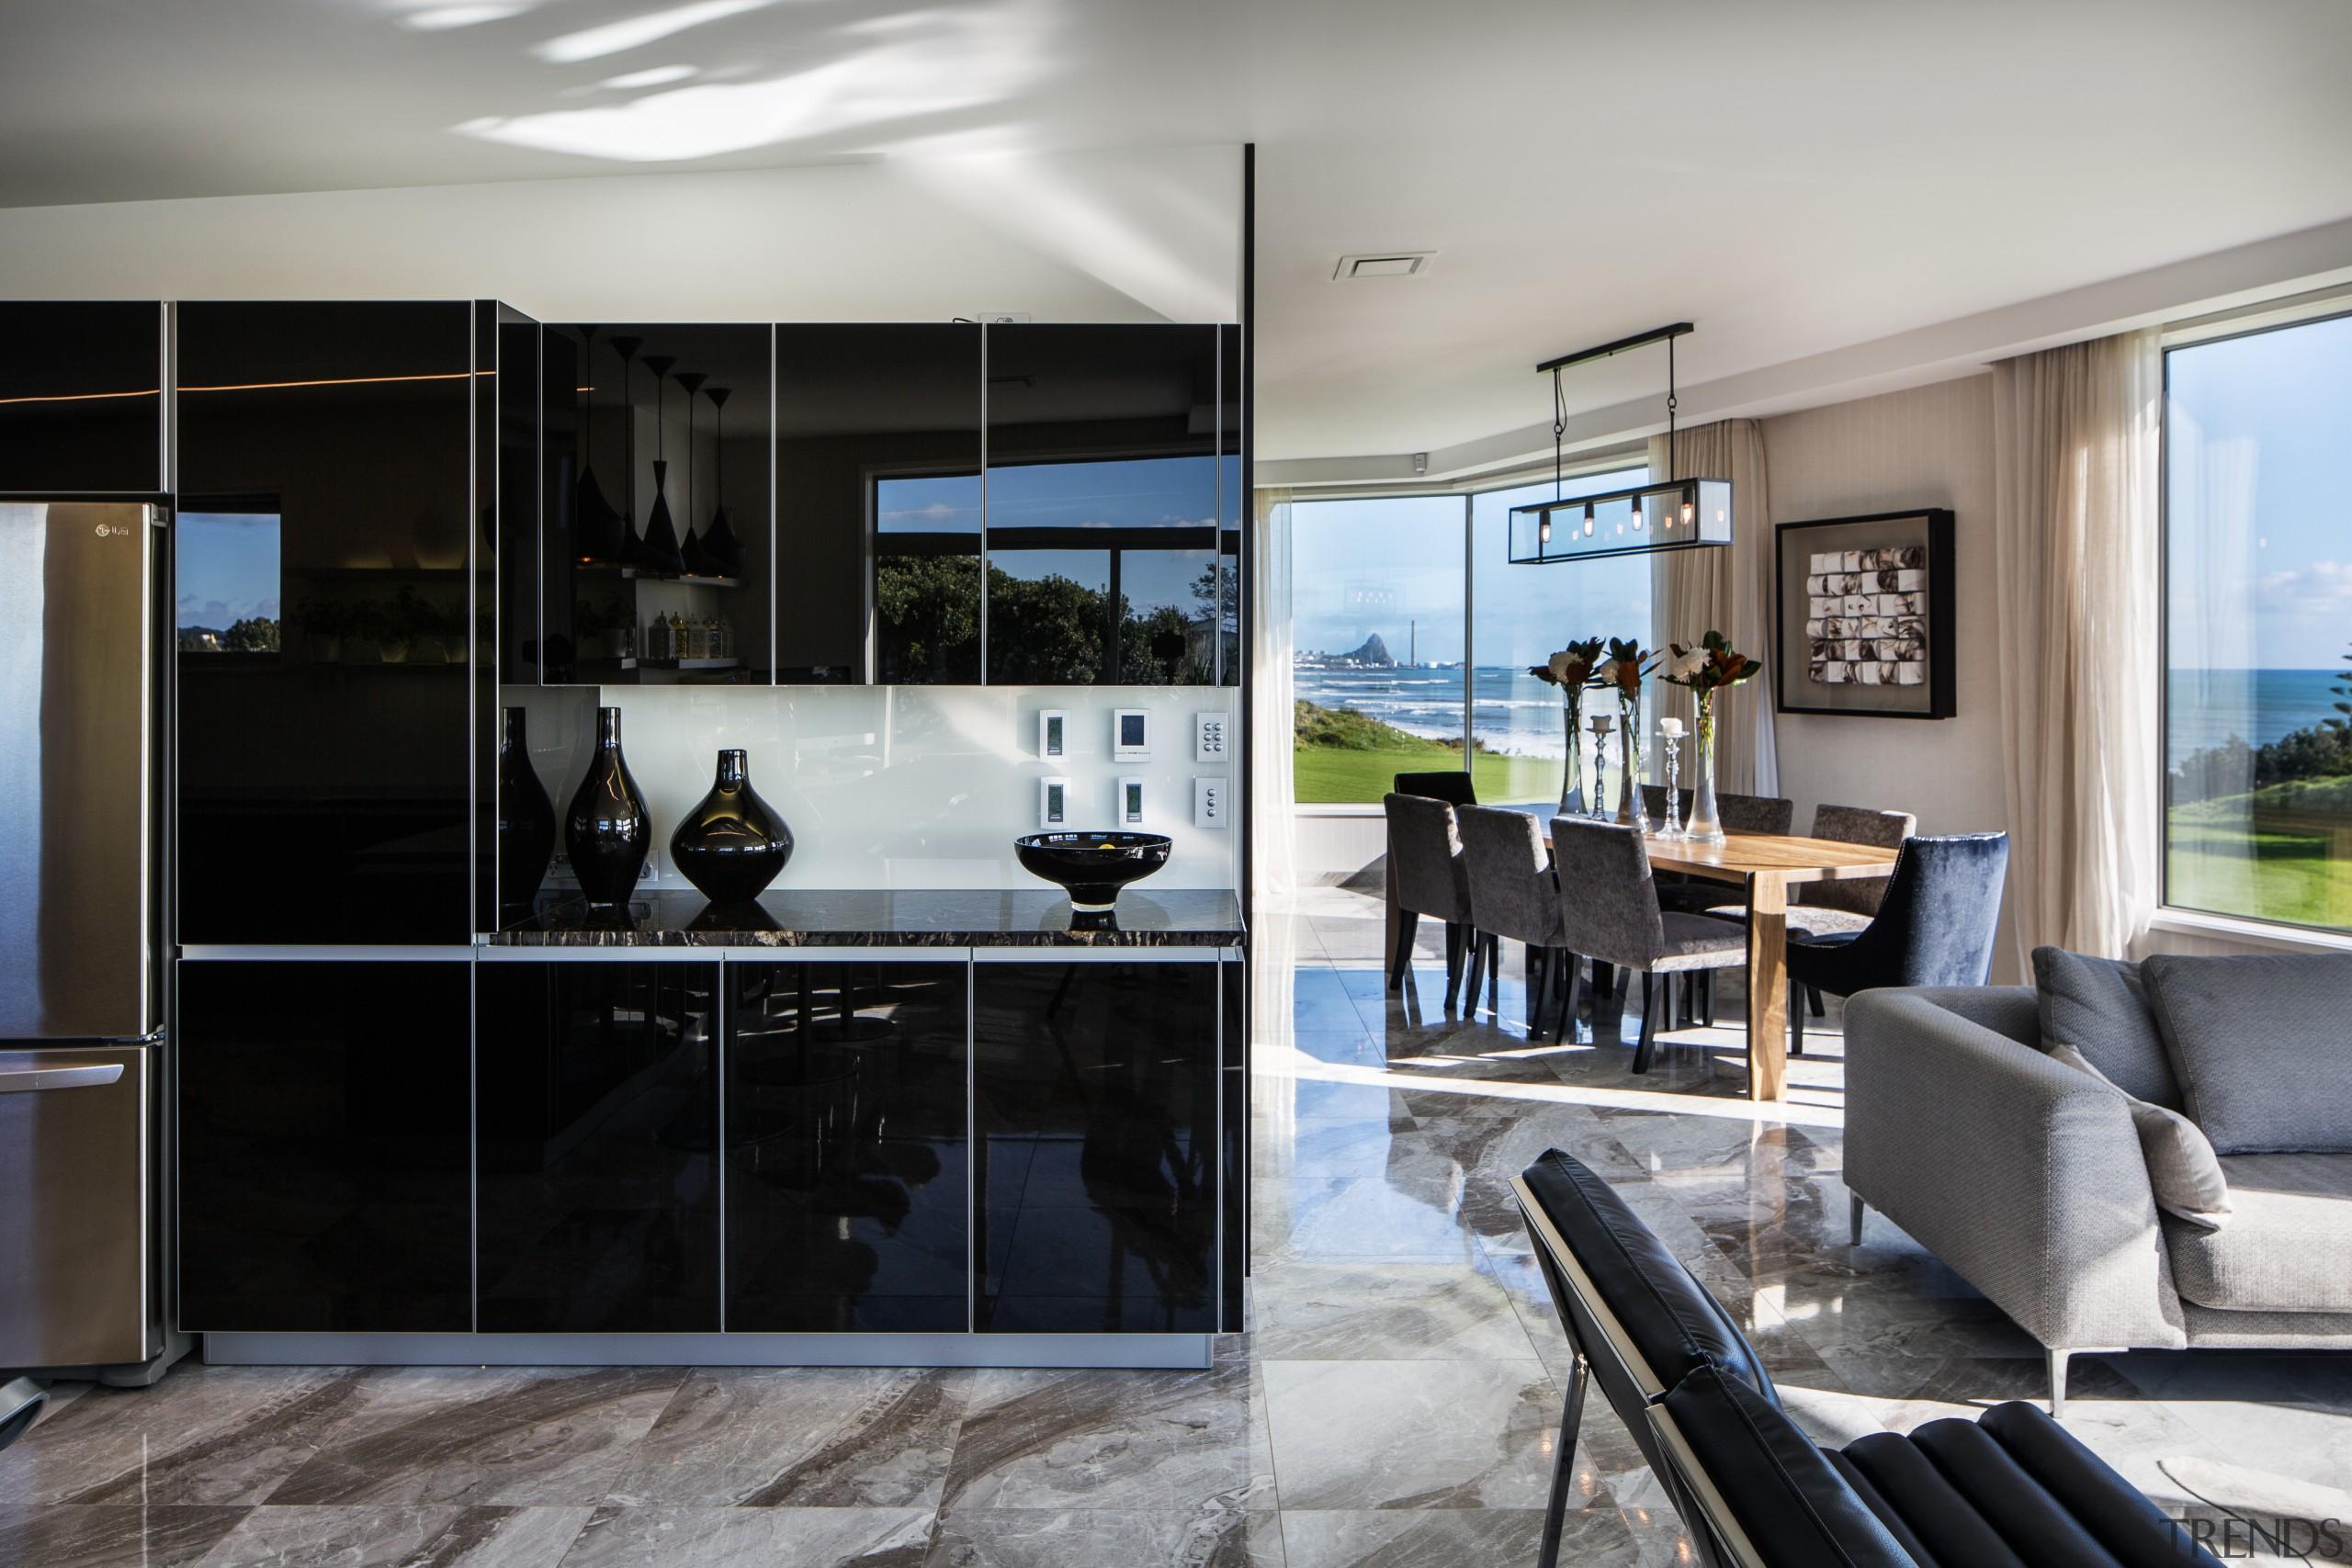 High gloss, textural Italian porcelain floor tiles emulate interior design, kitchen, window, gray, black